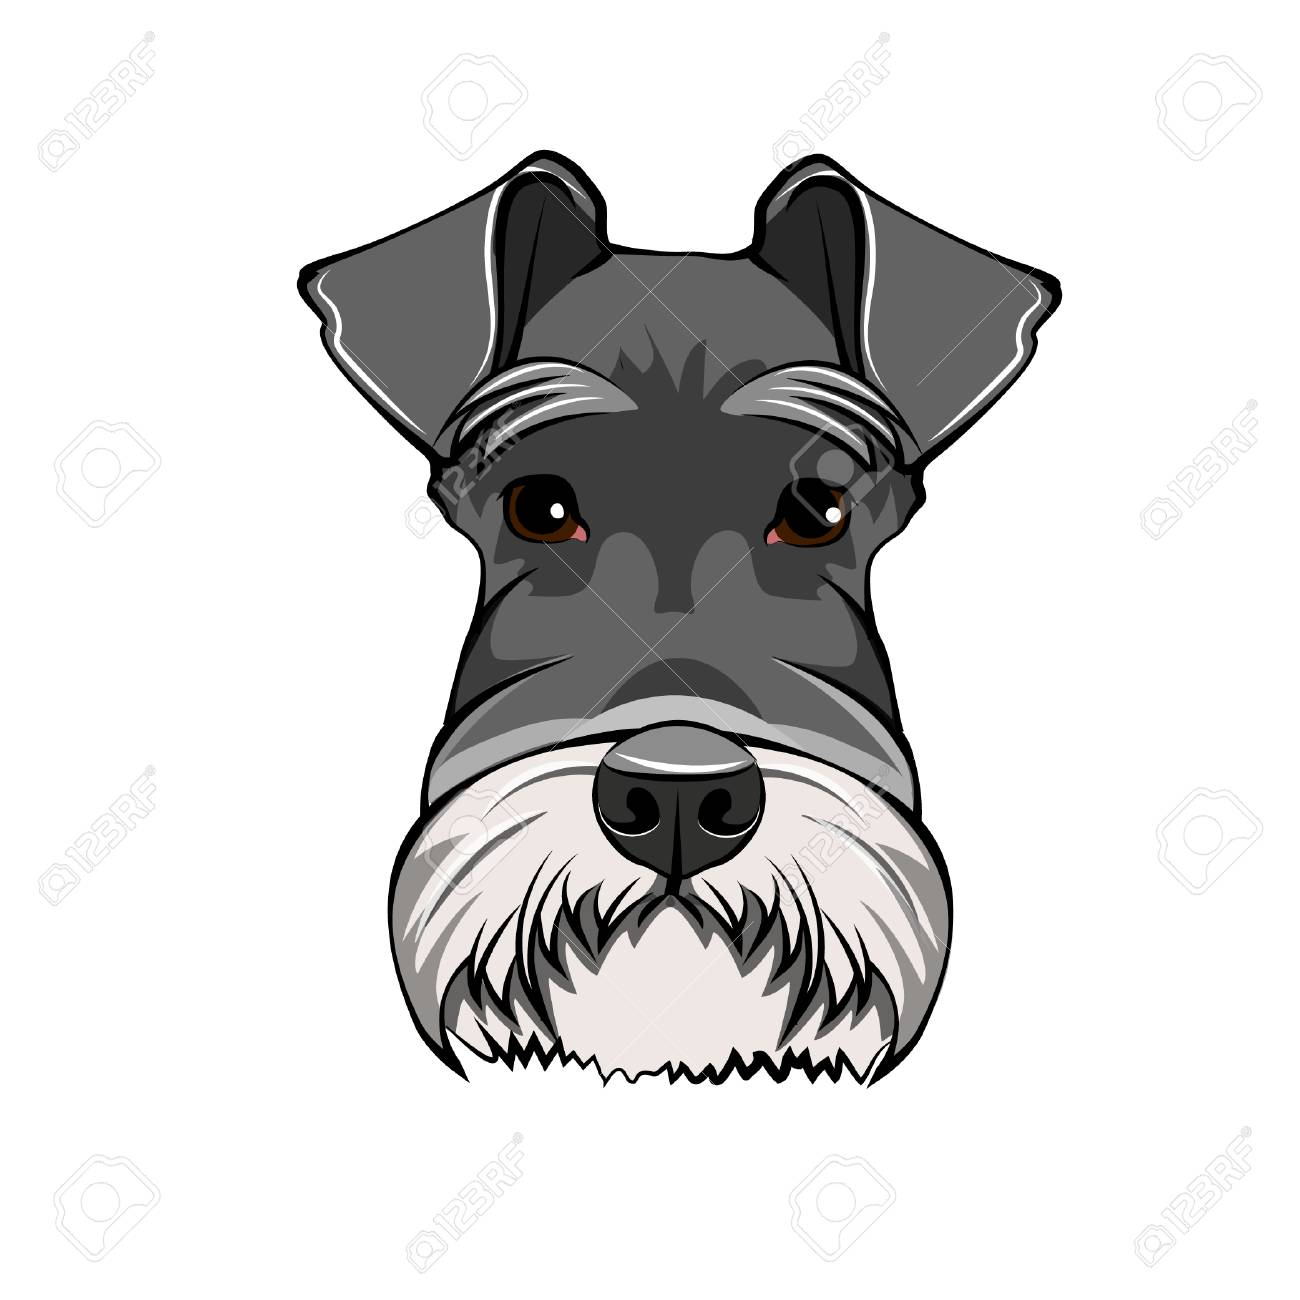 Schnauzer Dog Portrait. Dog Head, Face, Muzzle. Dog Breed Vector ...